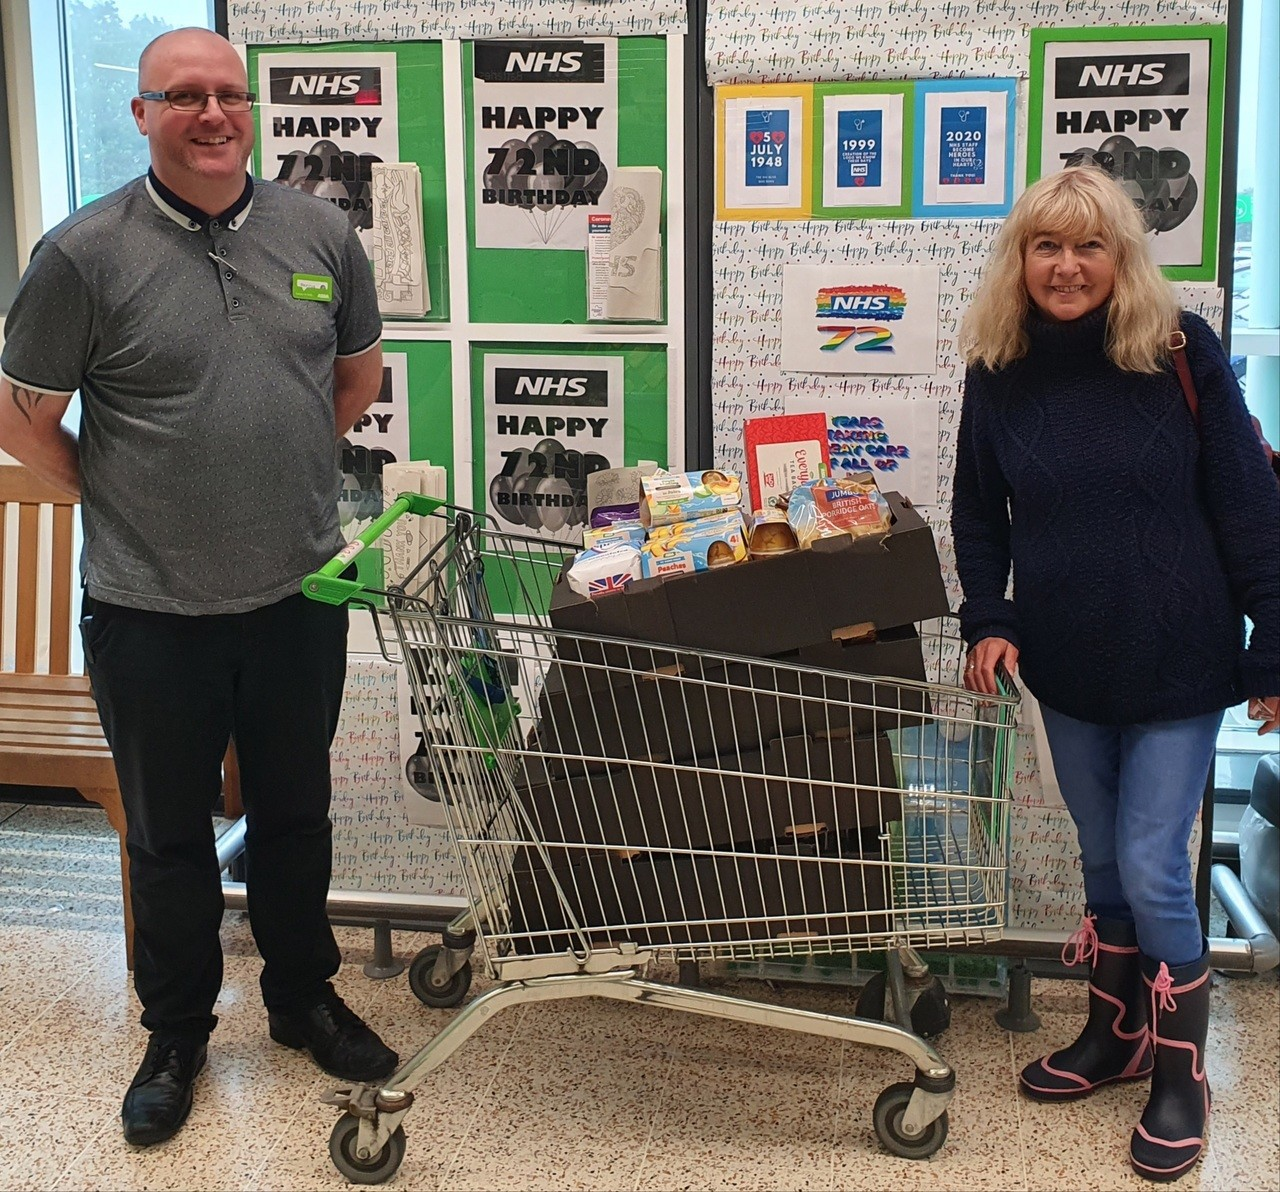 Plymouth Pie Club donation | Asda Plymouth